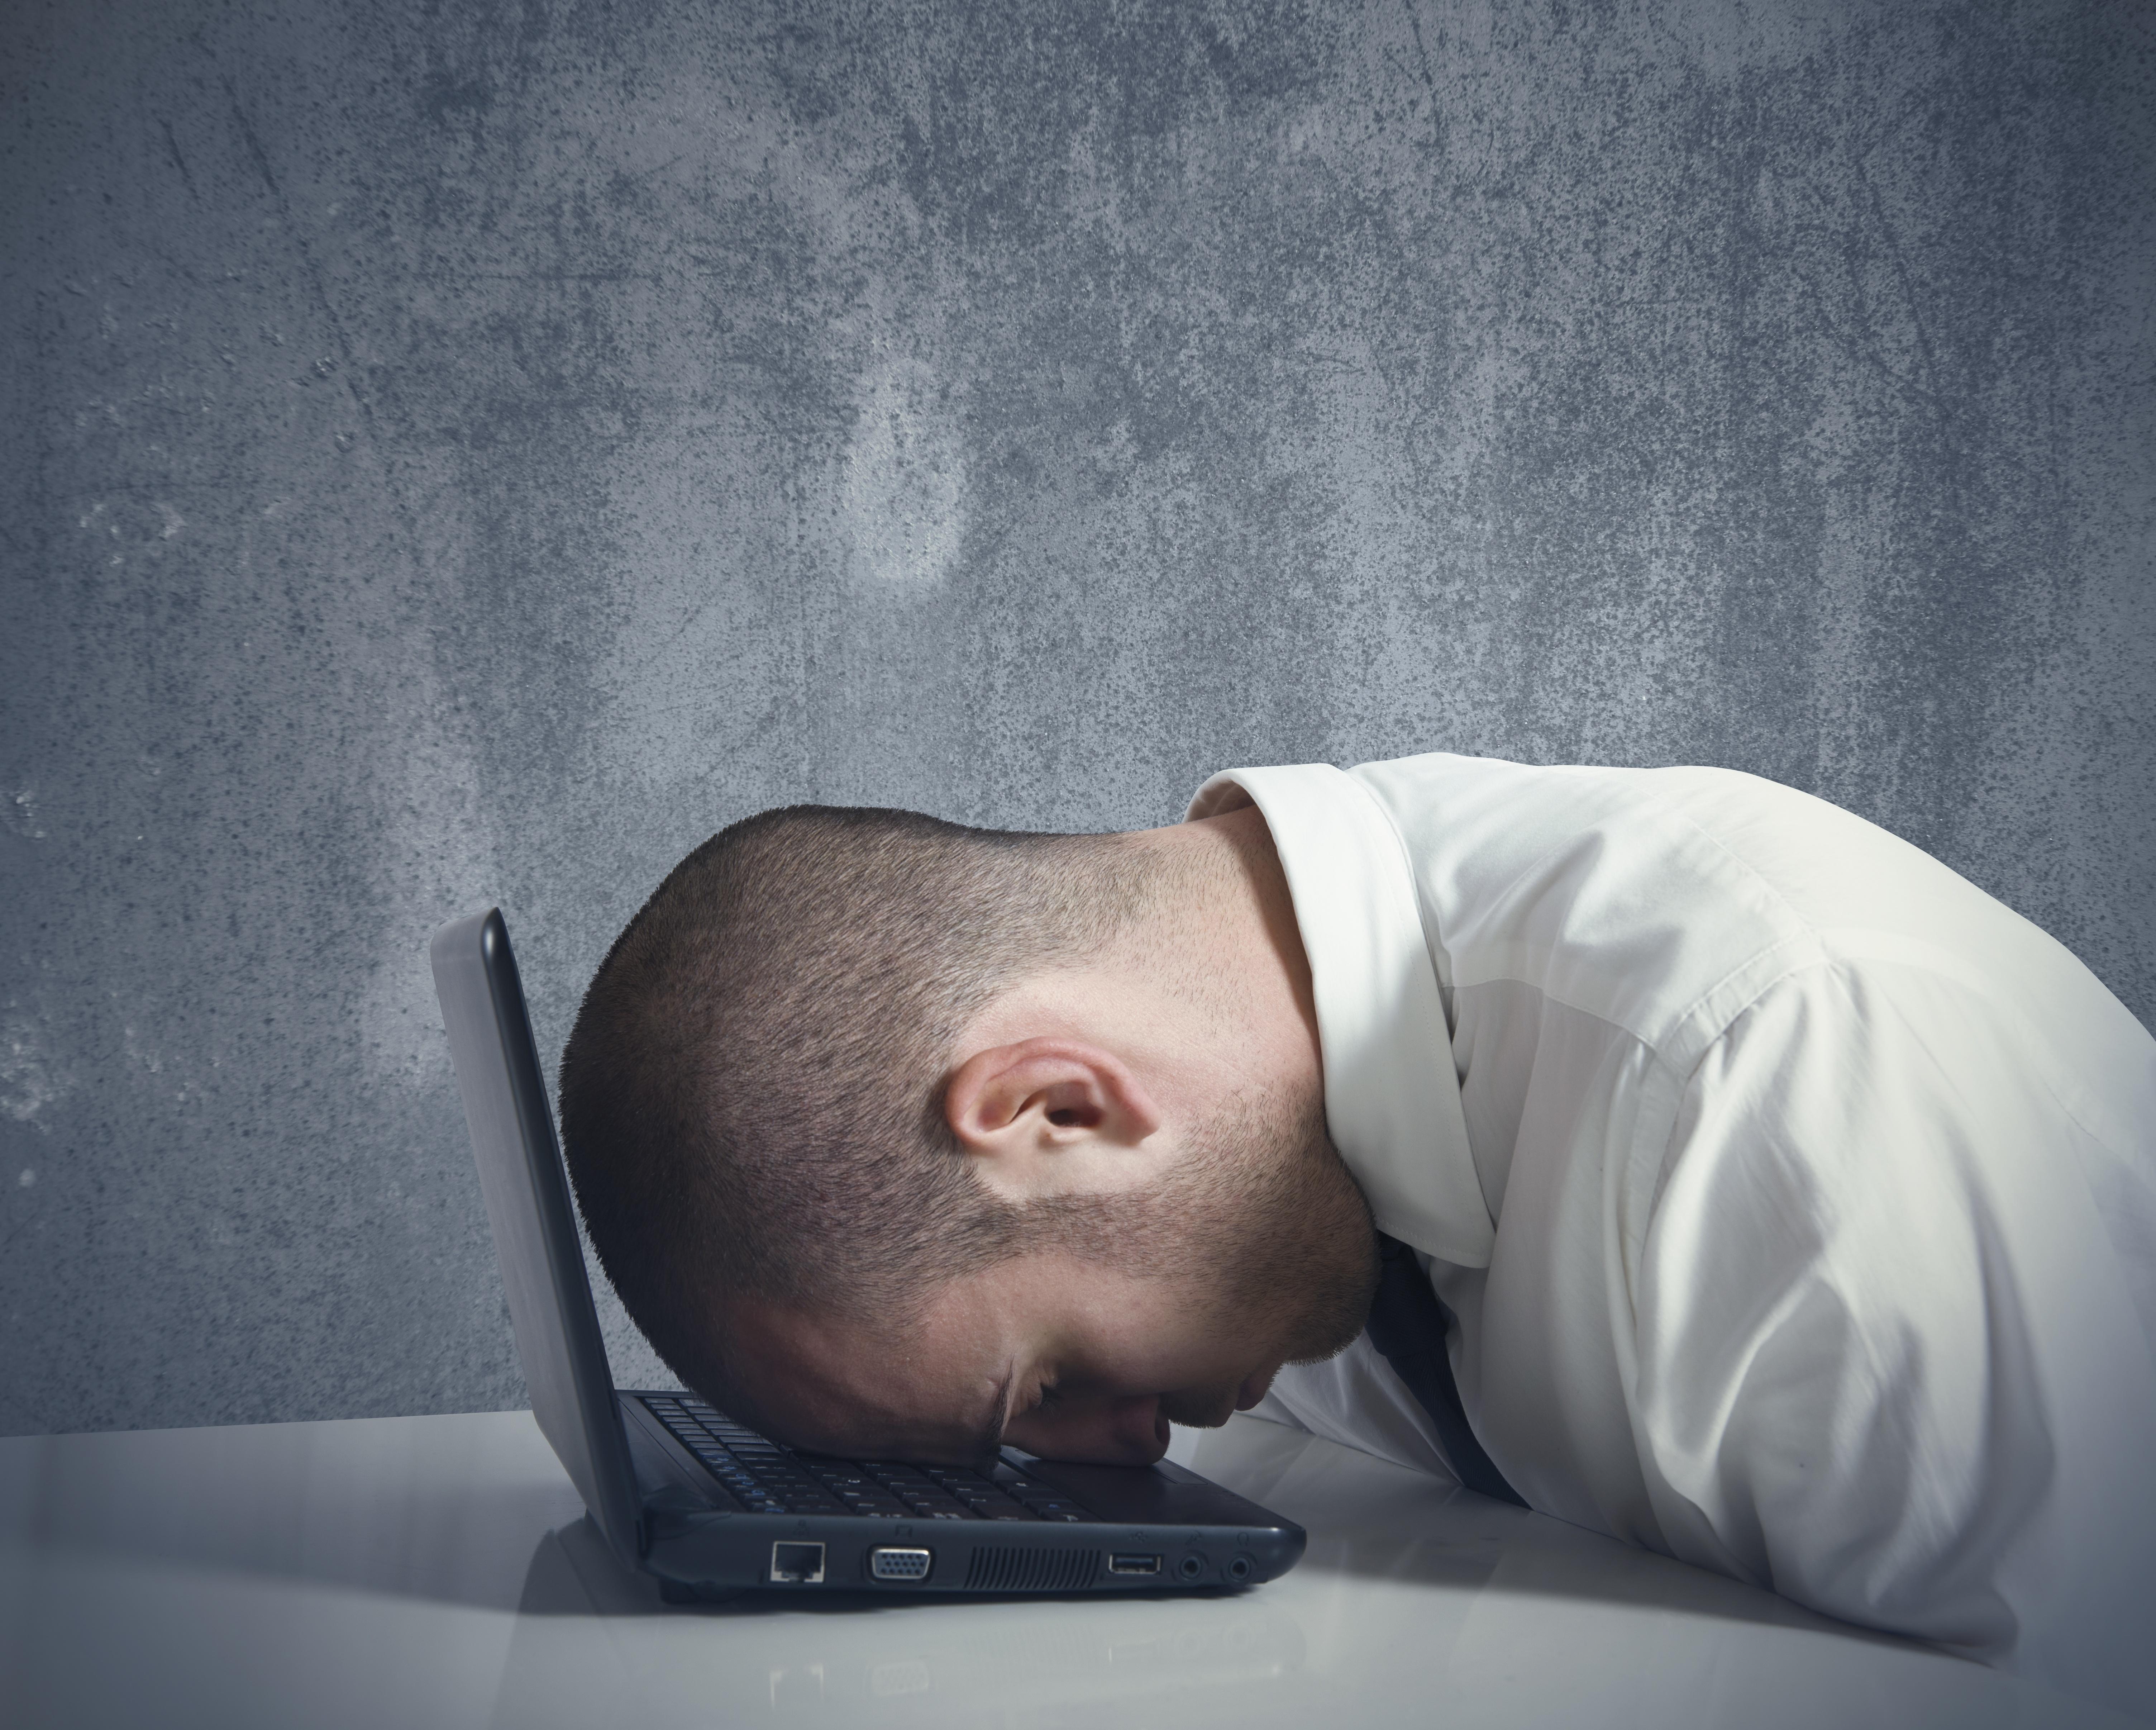 man_with_head_on_laptop.jpg